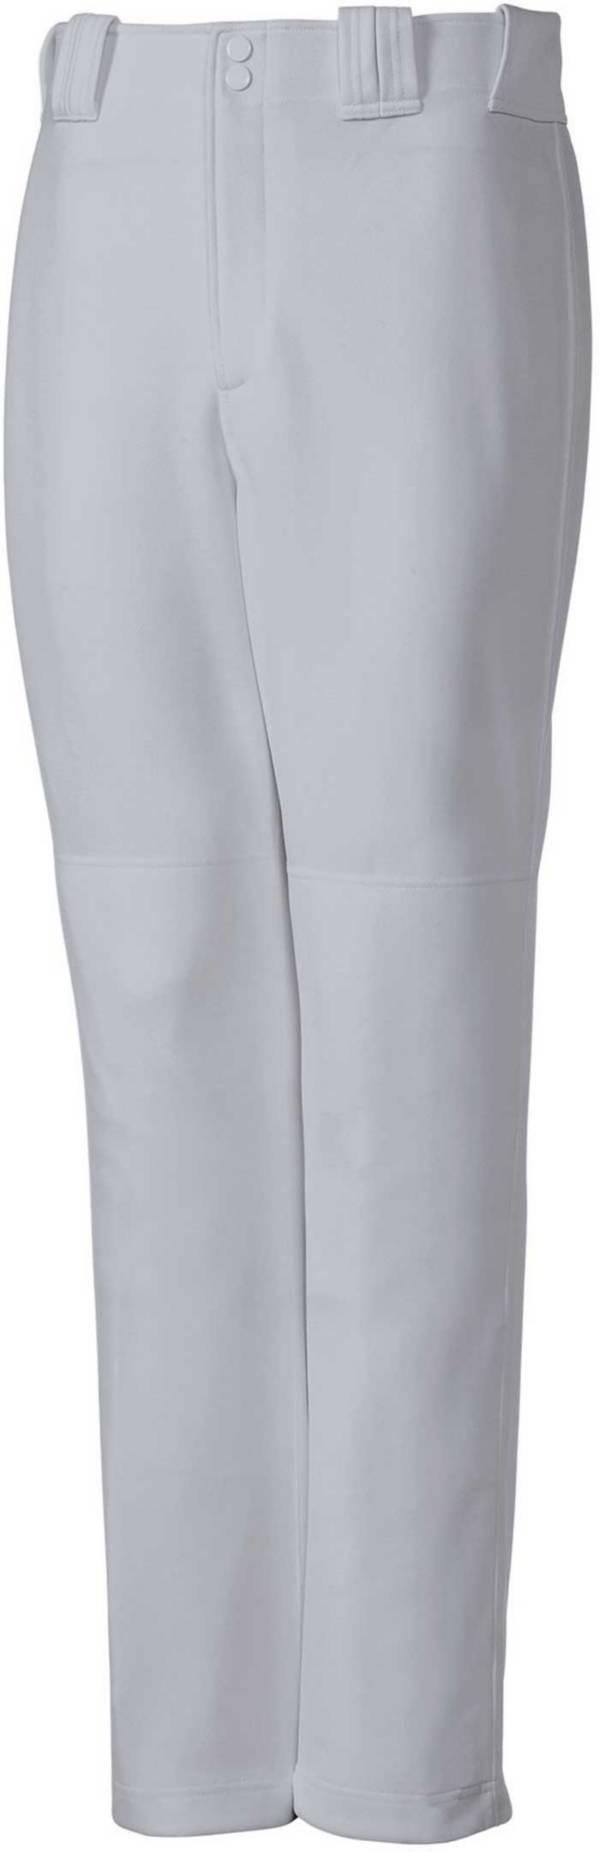 Mizuno Men's MVP Pro Baseball Pants product image